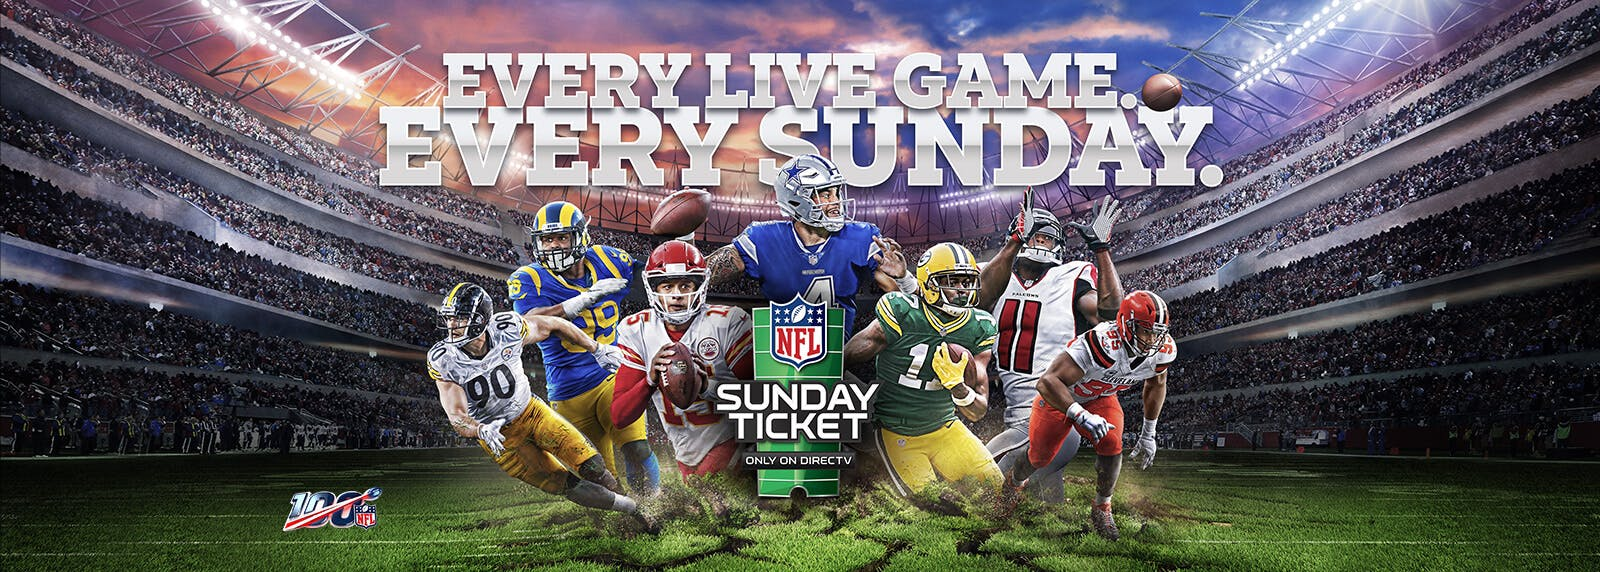 watch rams vs 49ers live stream nfl sunday ticket